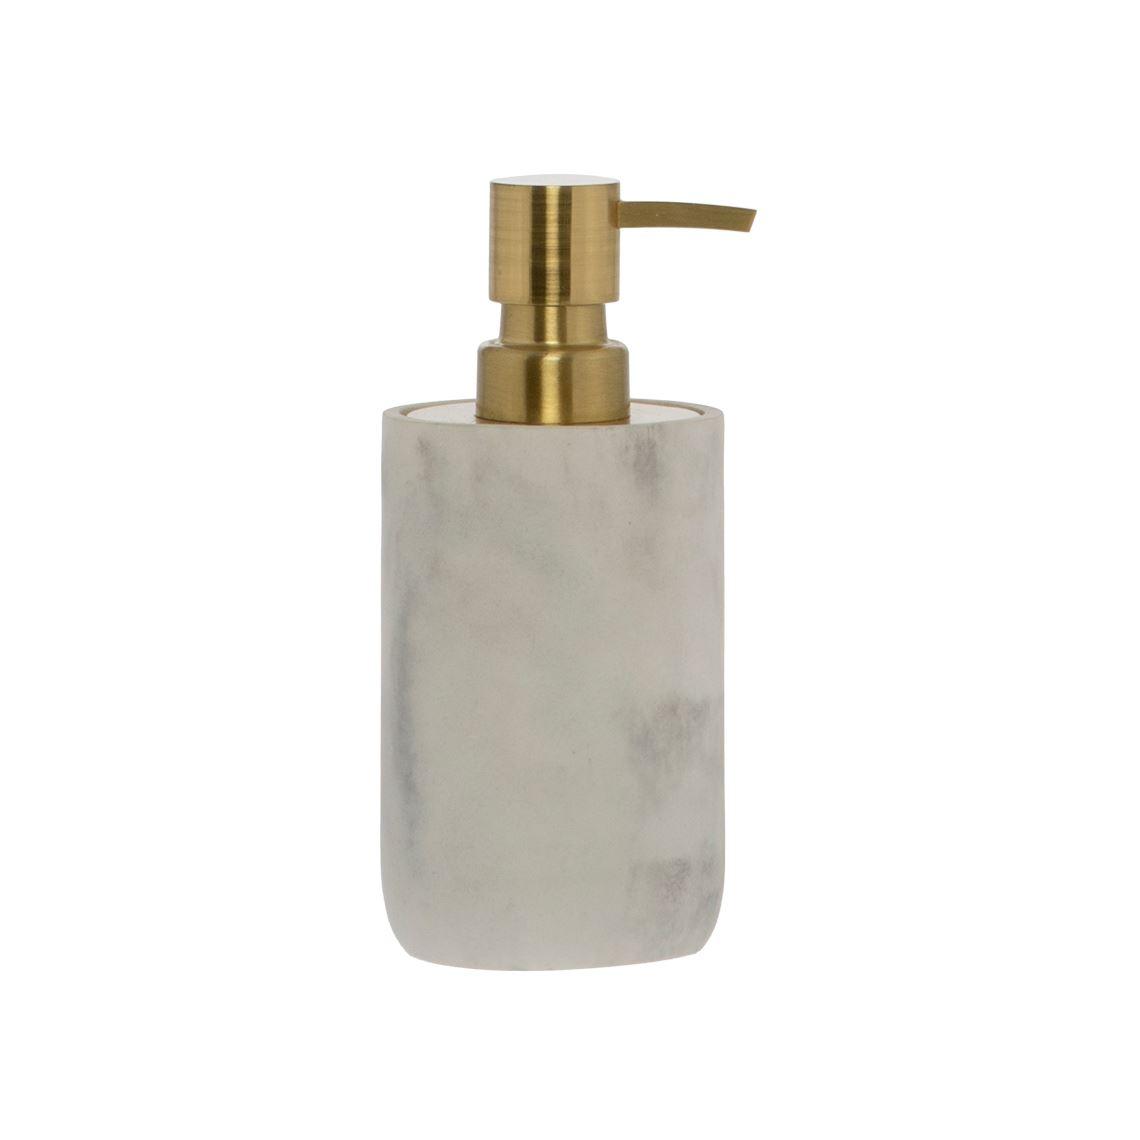 Mersin Soap Dispenser Size W 7cm x D 7cm x H 17cm in Marble Effect Freedom